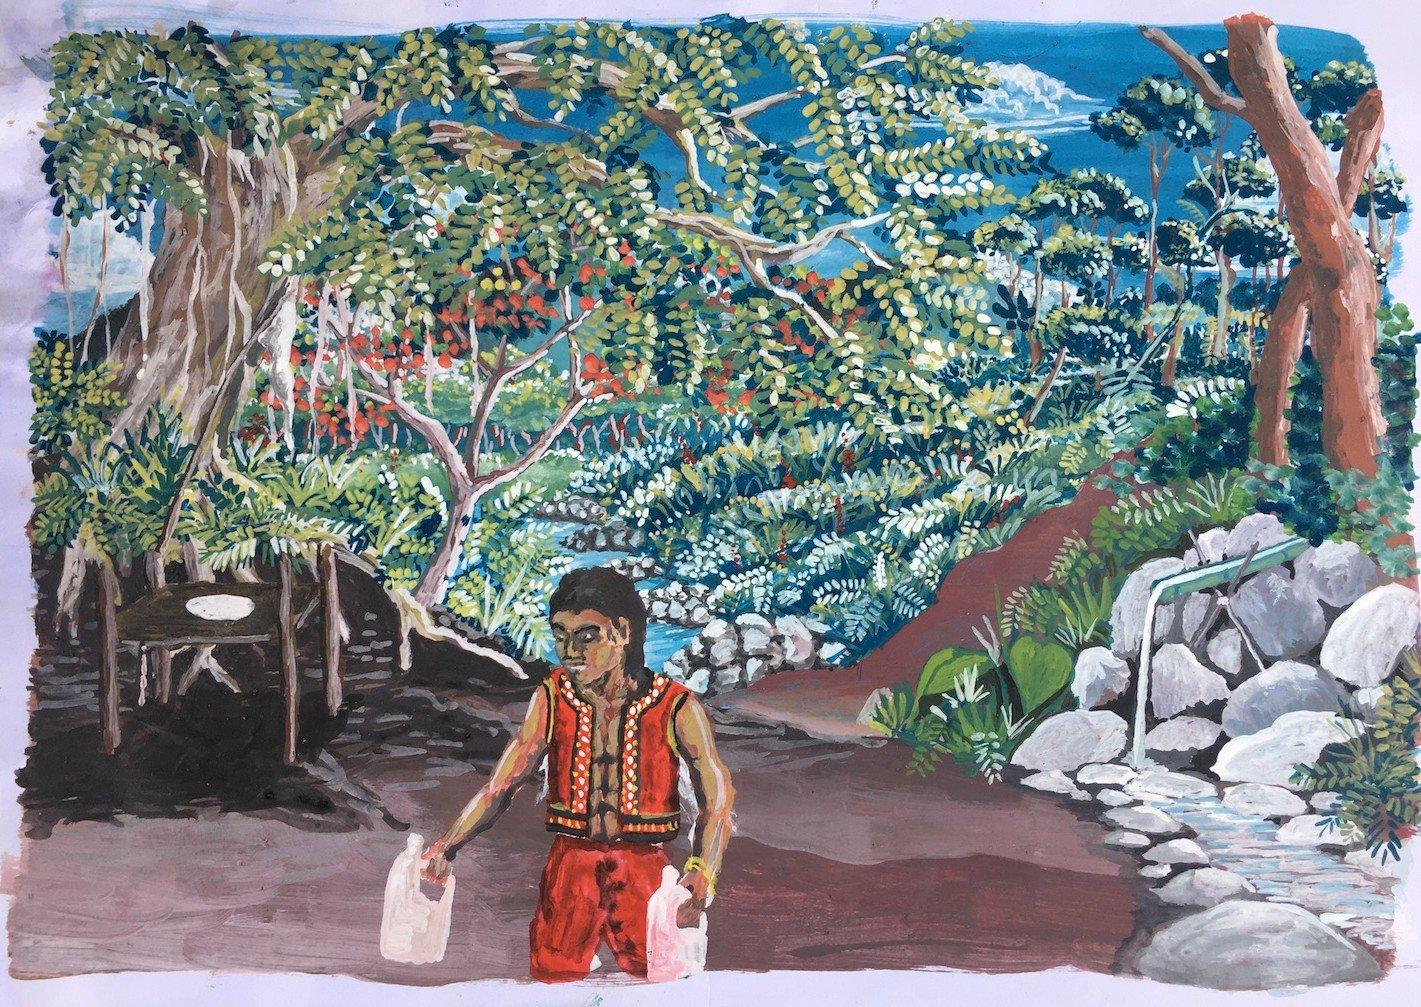 An indigenous reflection on ecospirituality